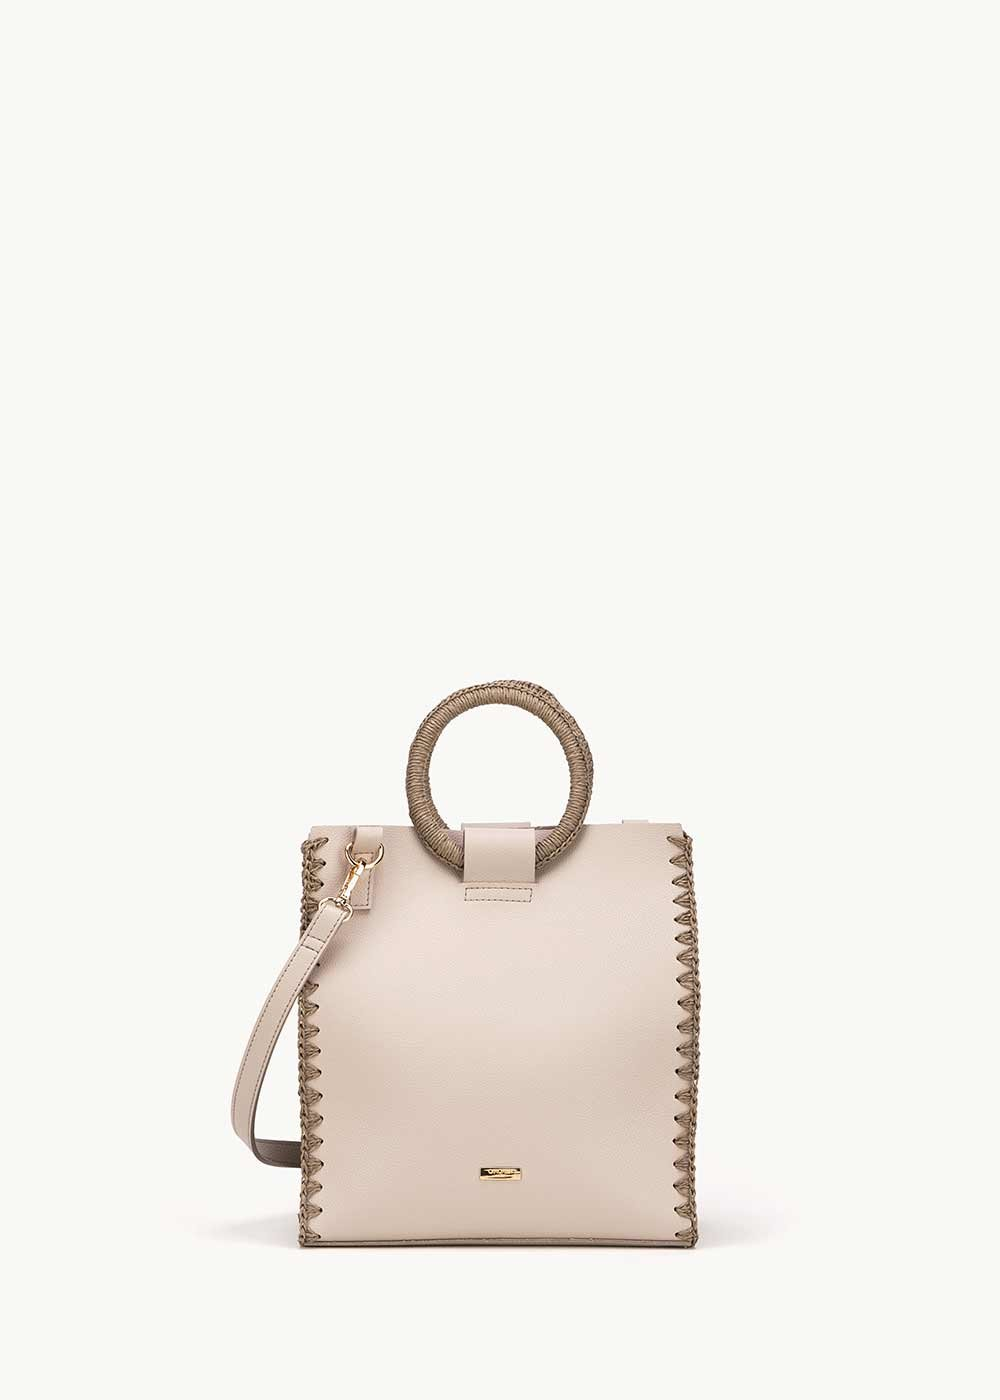 Bryan small bag with circular handles - Taupe - Woman